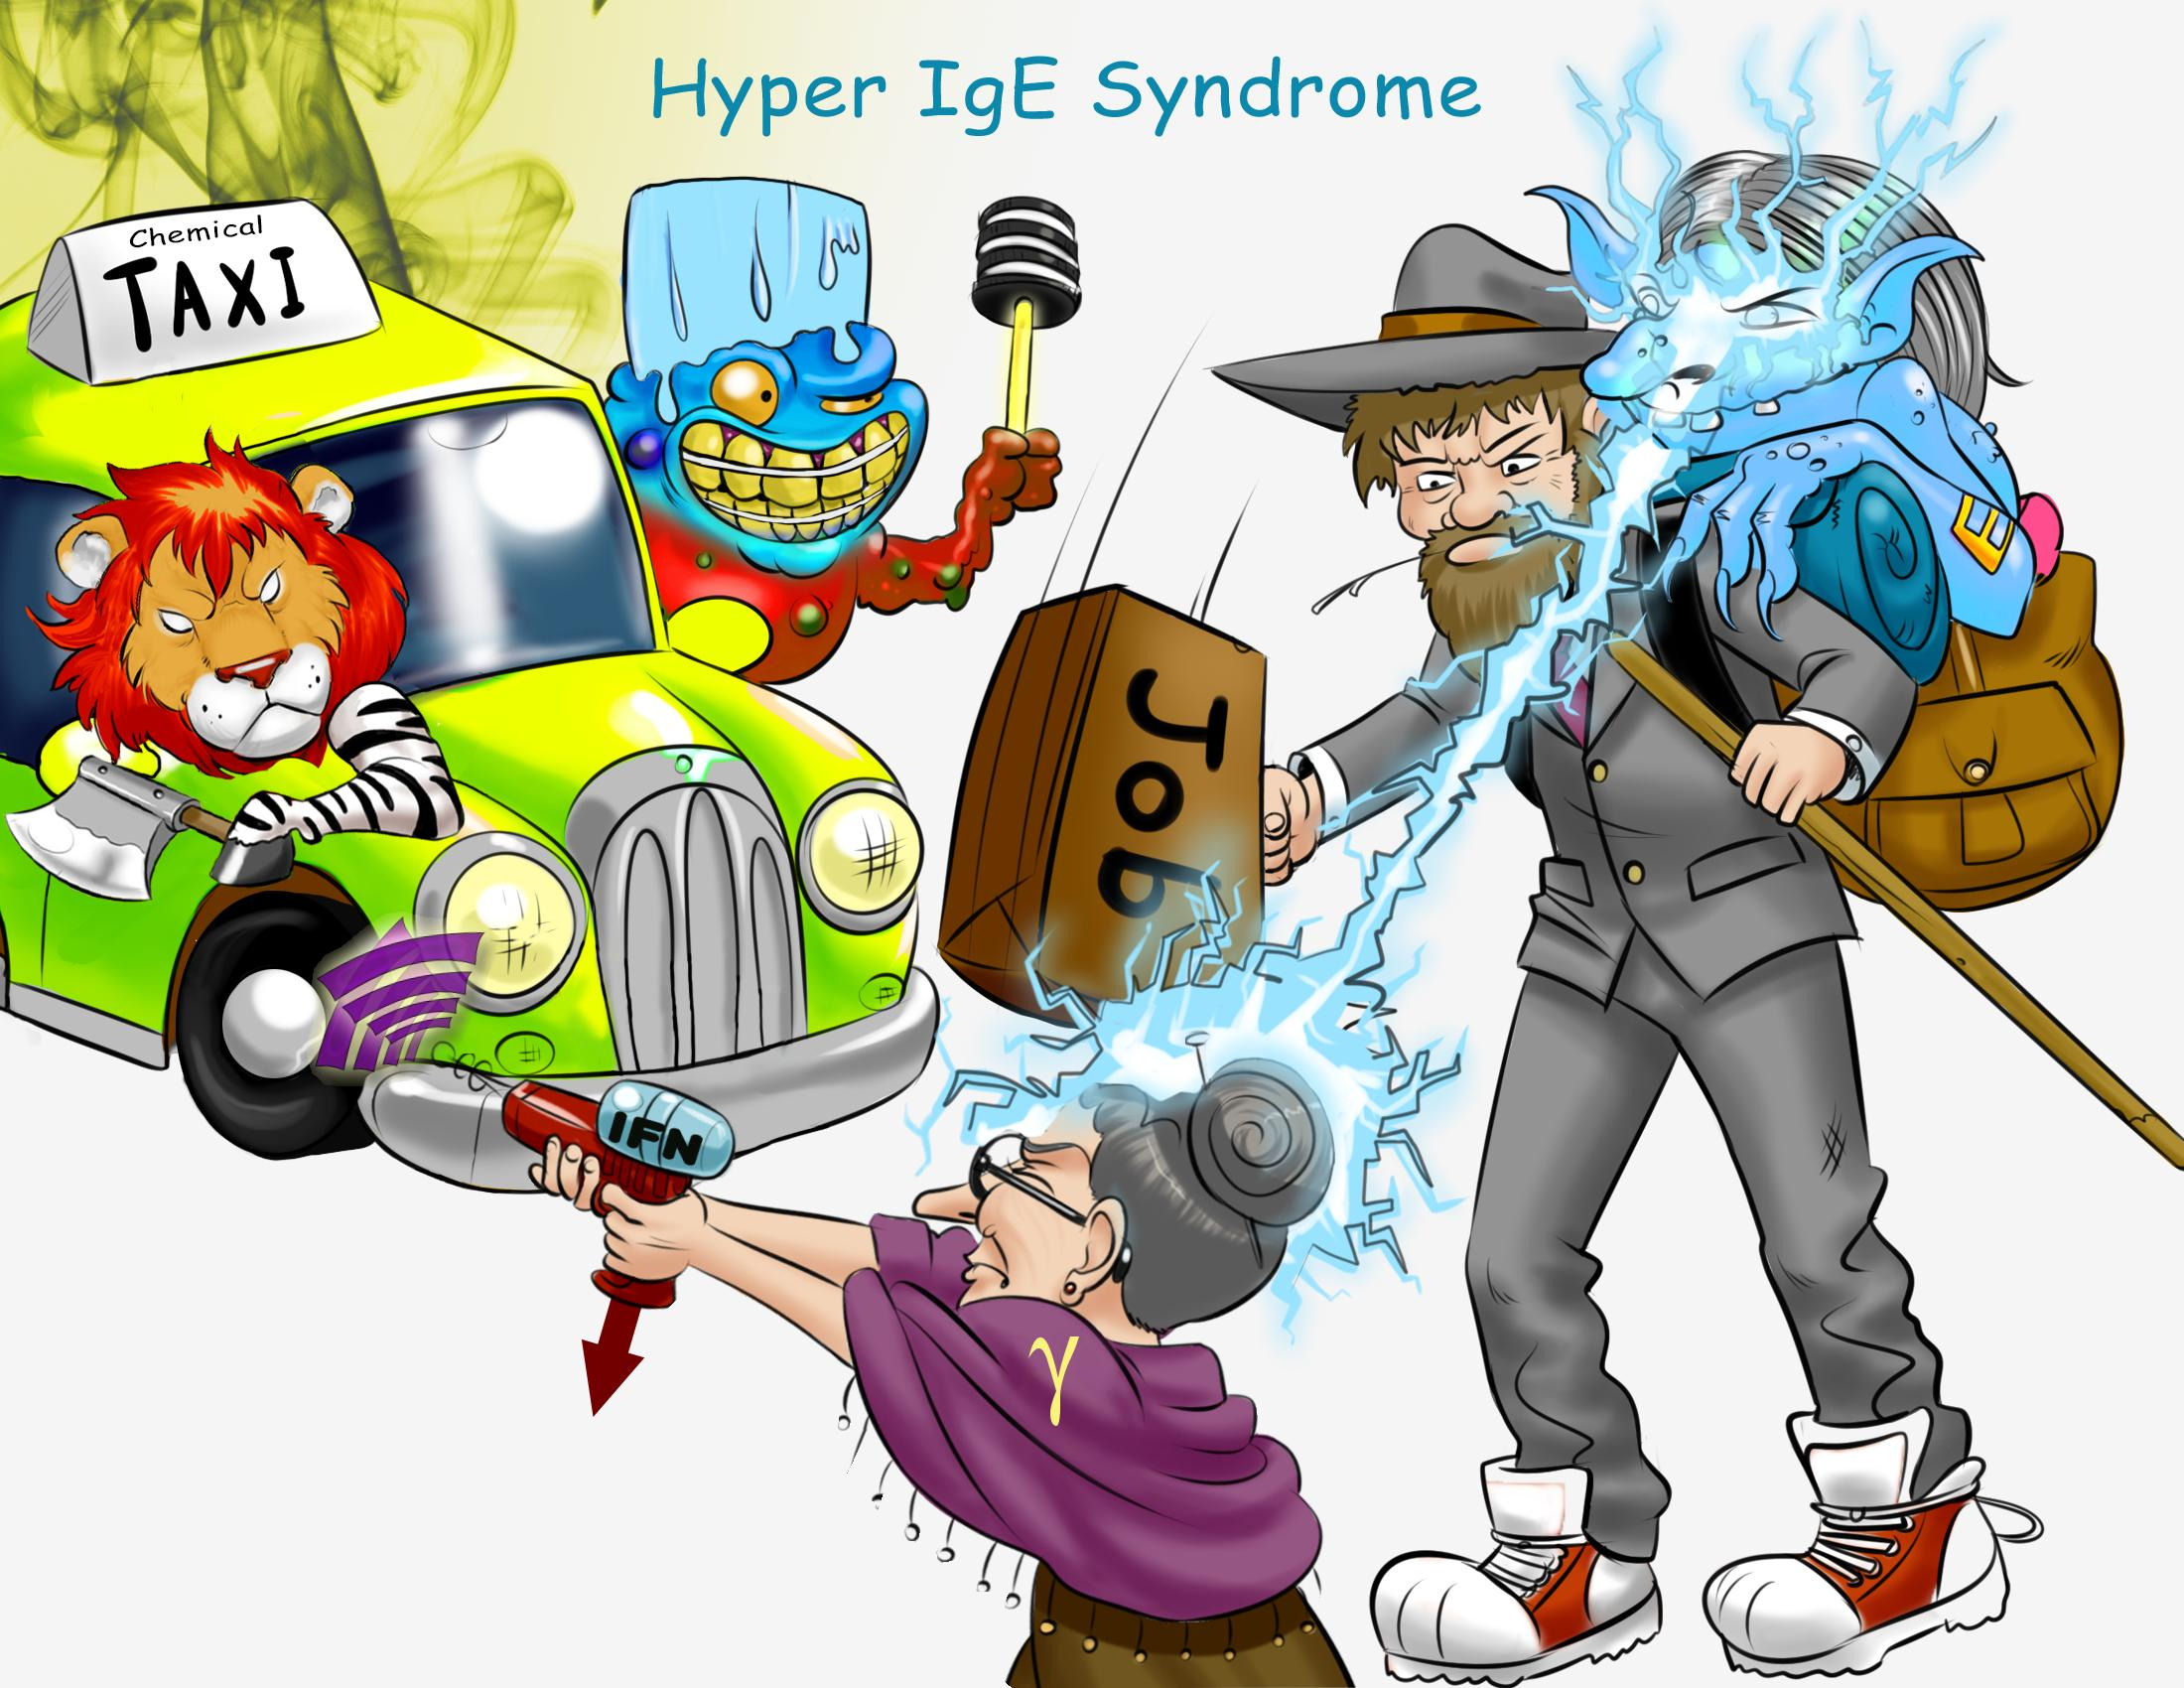 Hyper IgE Syndrome